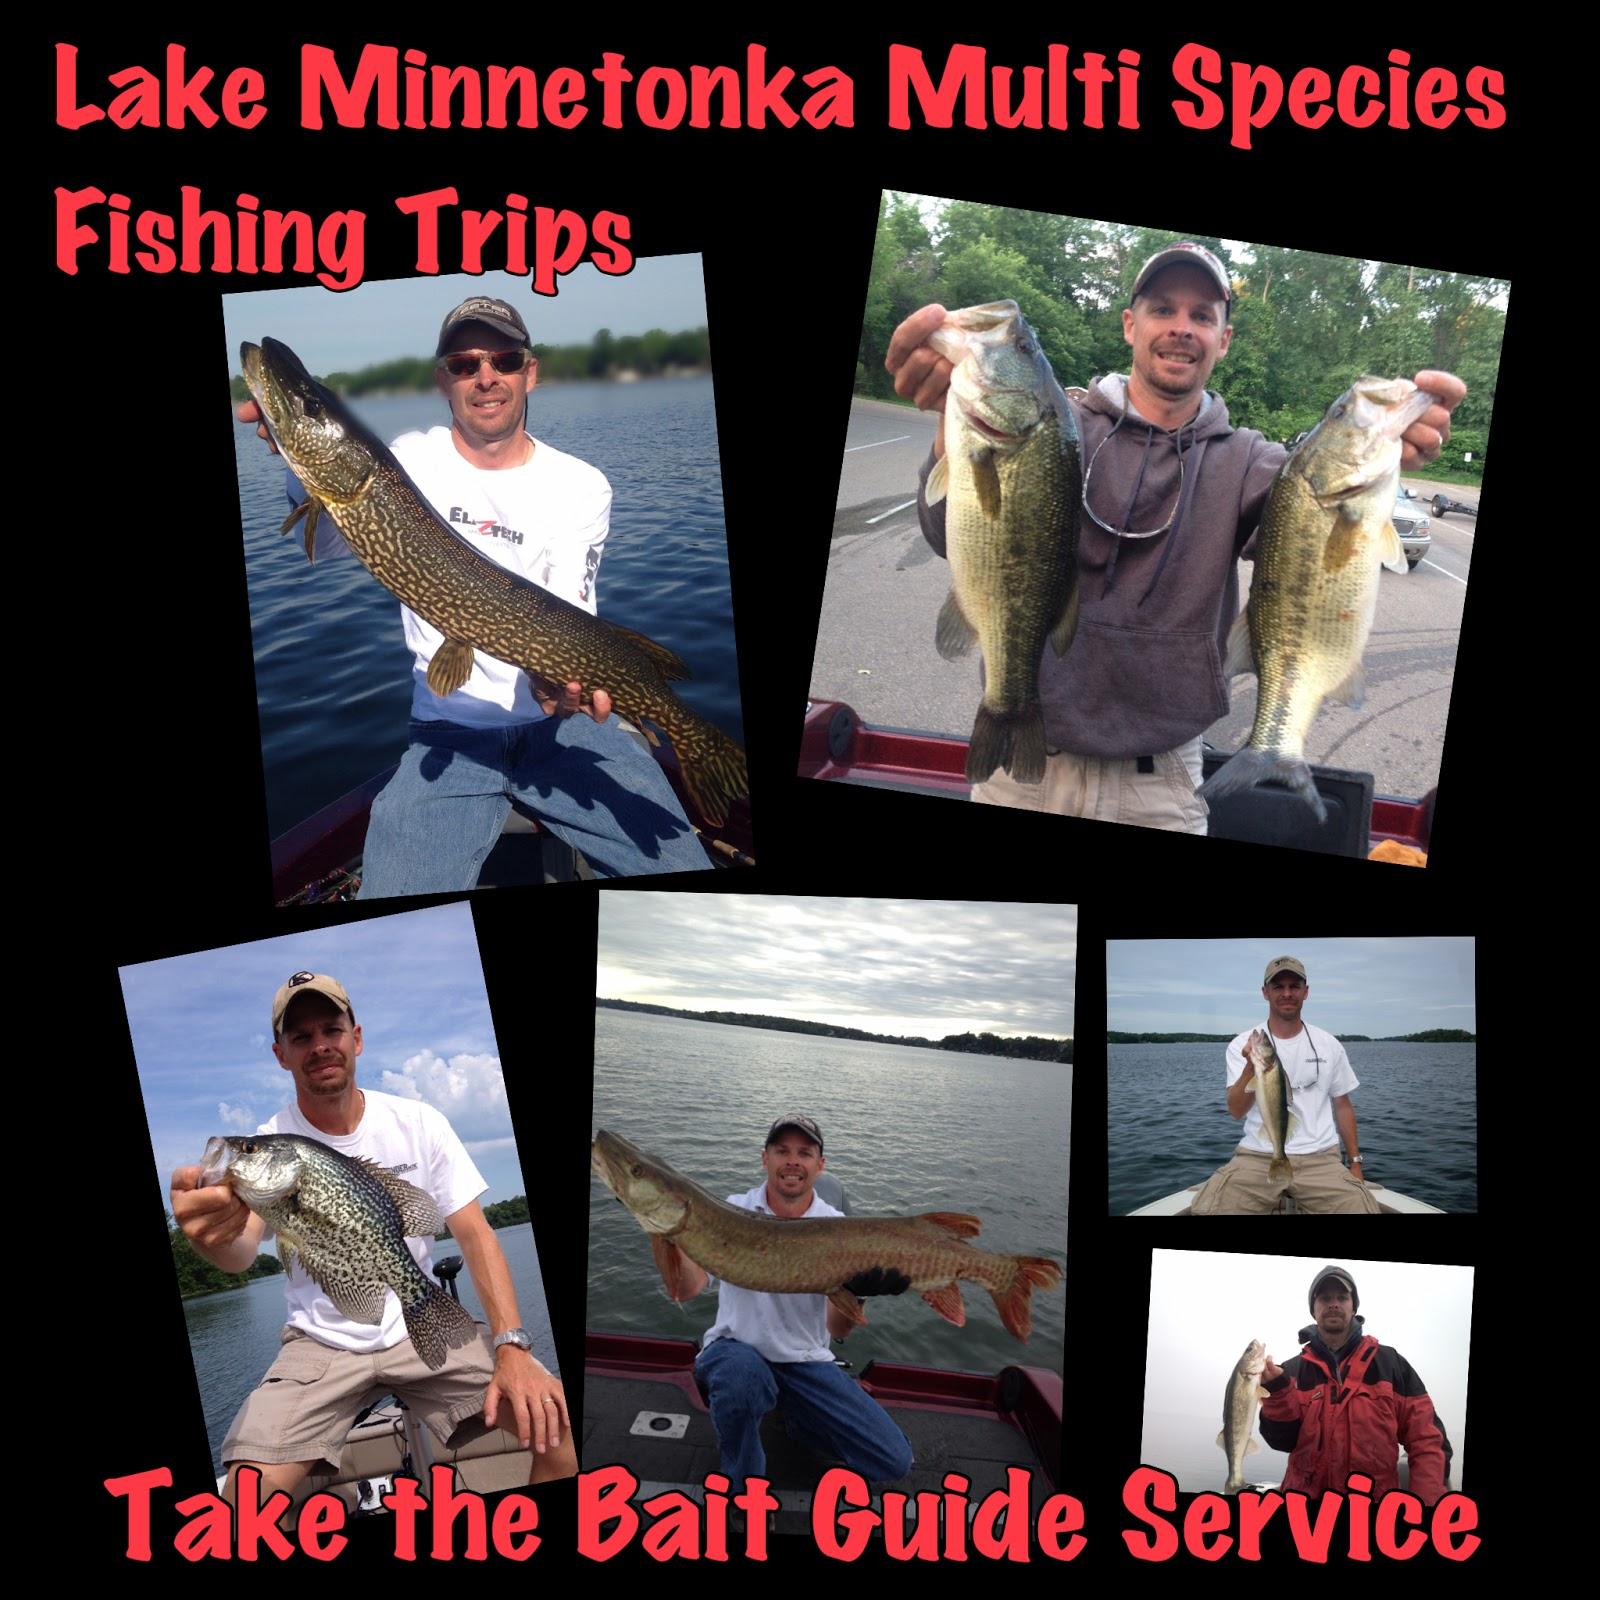 Take the bait guide service on lake minnetonka for Lake minnetonka fishing guide